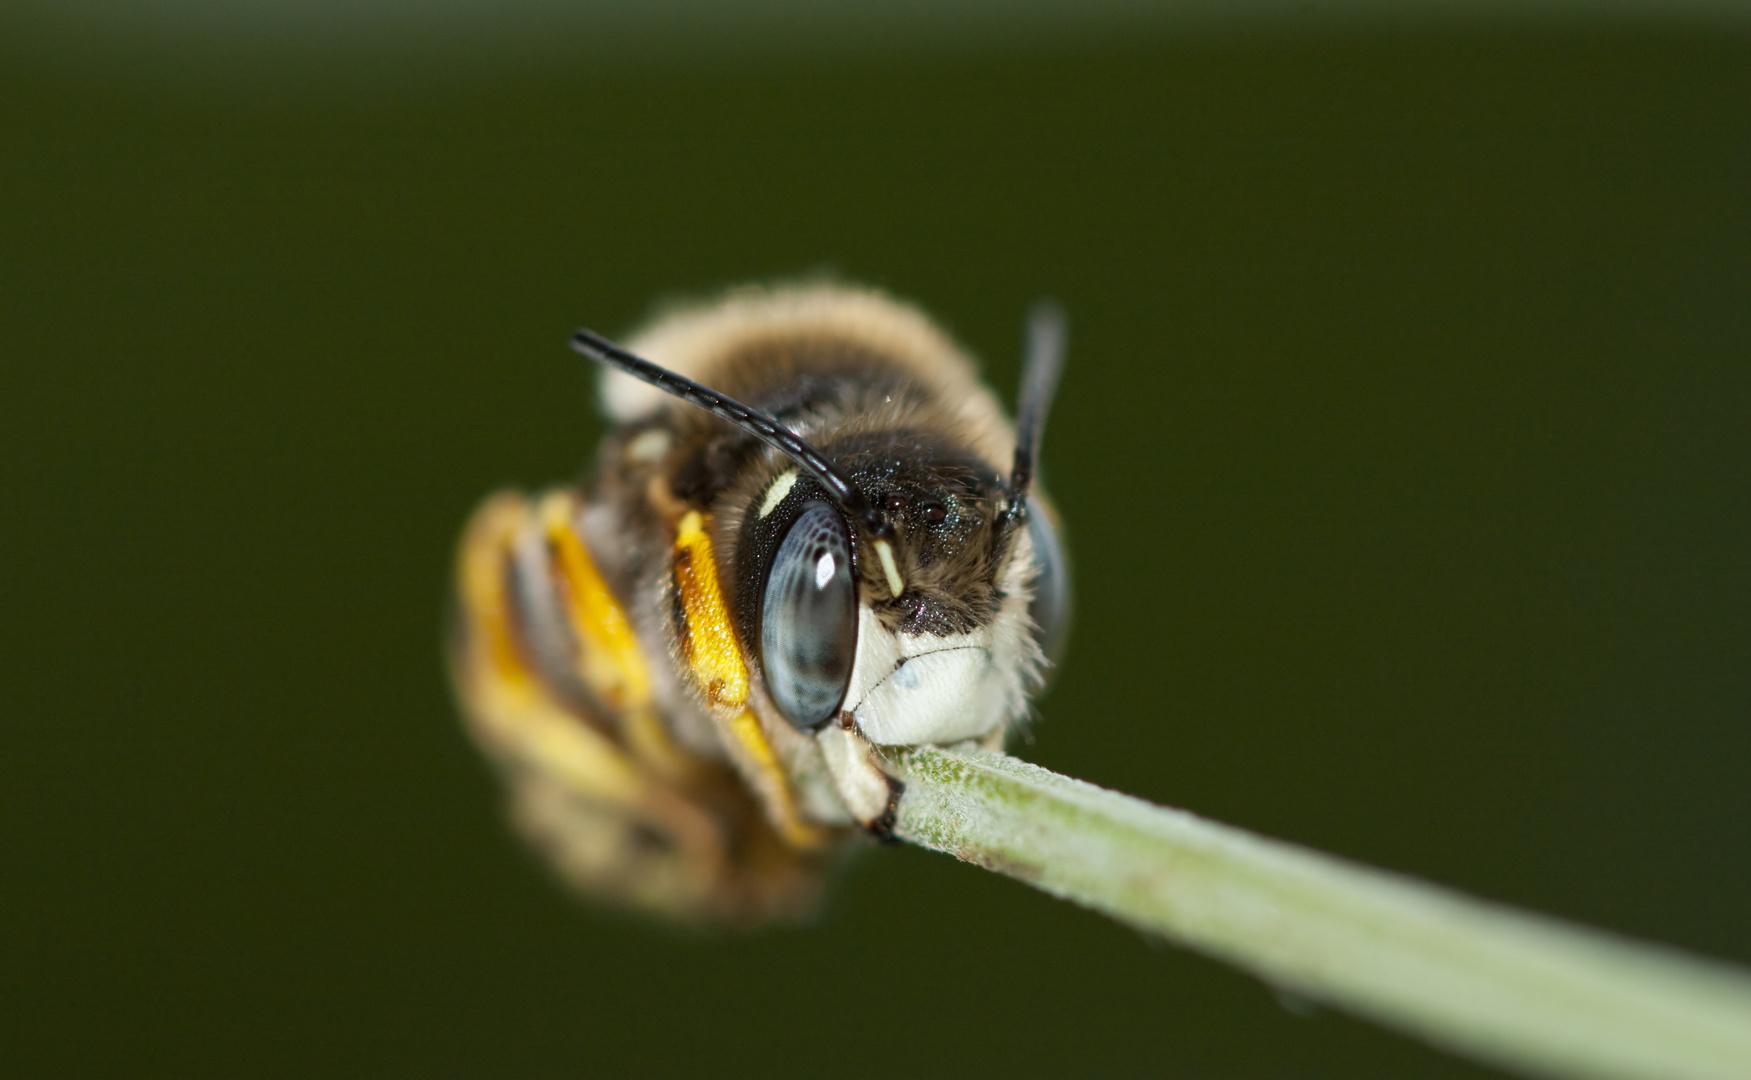 Anthophora bimaculata